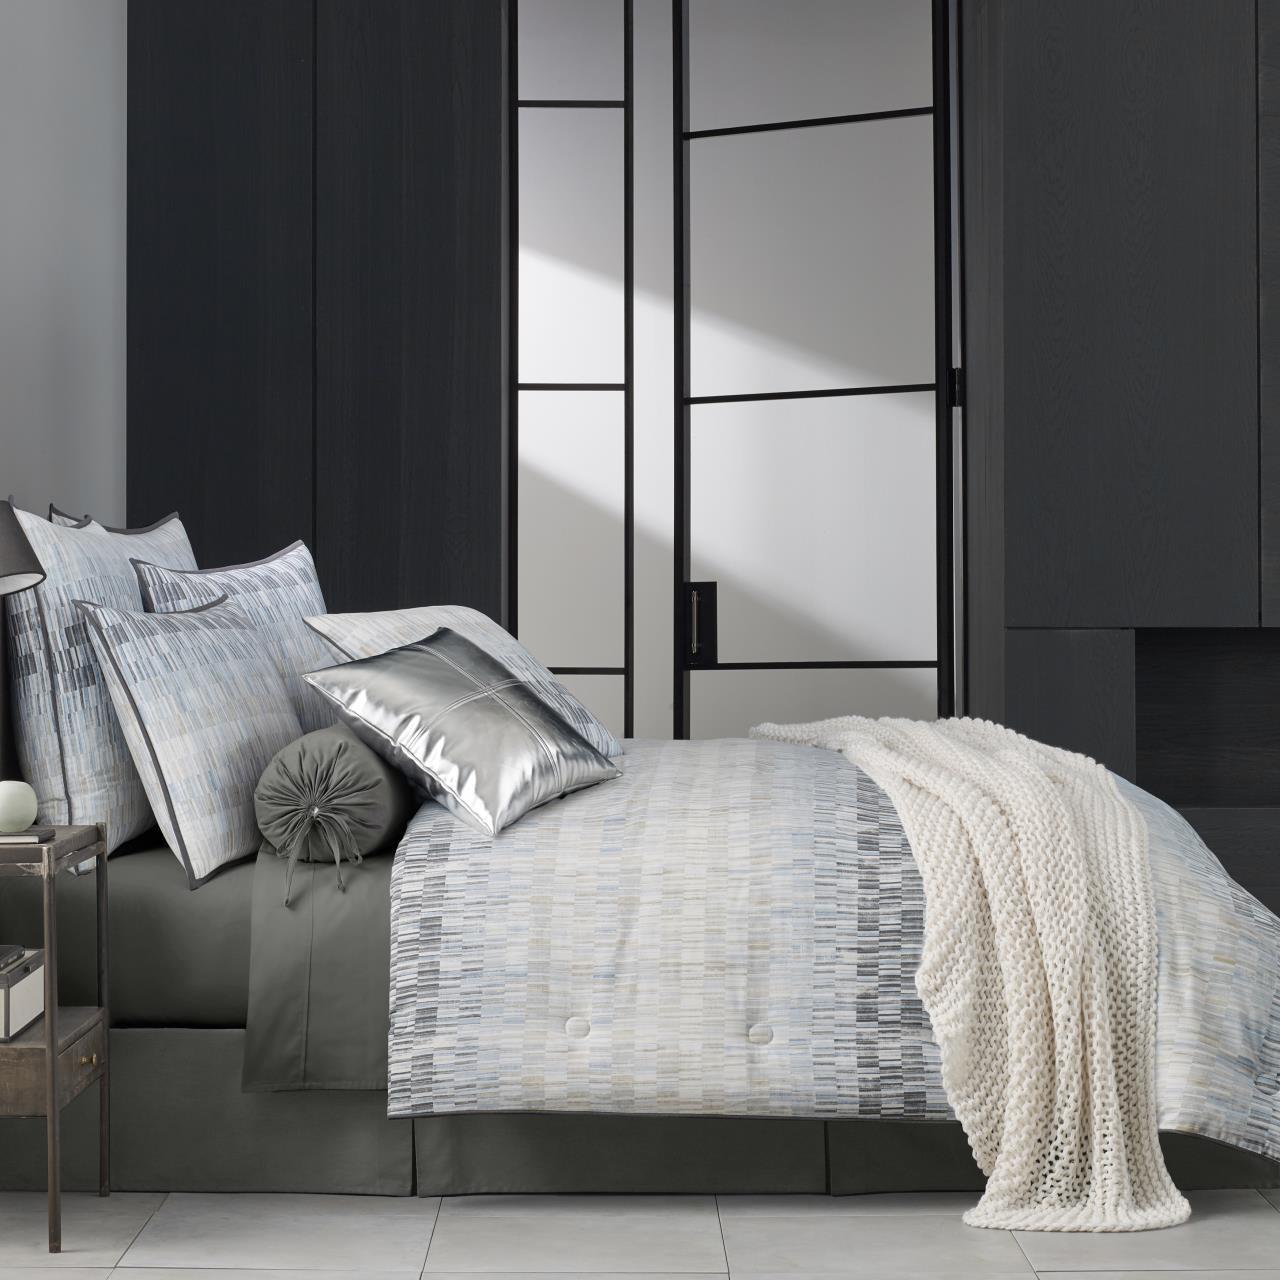 Flatiron Teal Bedding Collection -